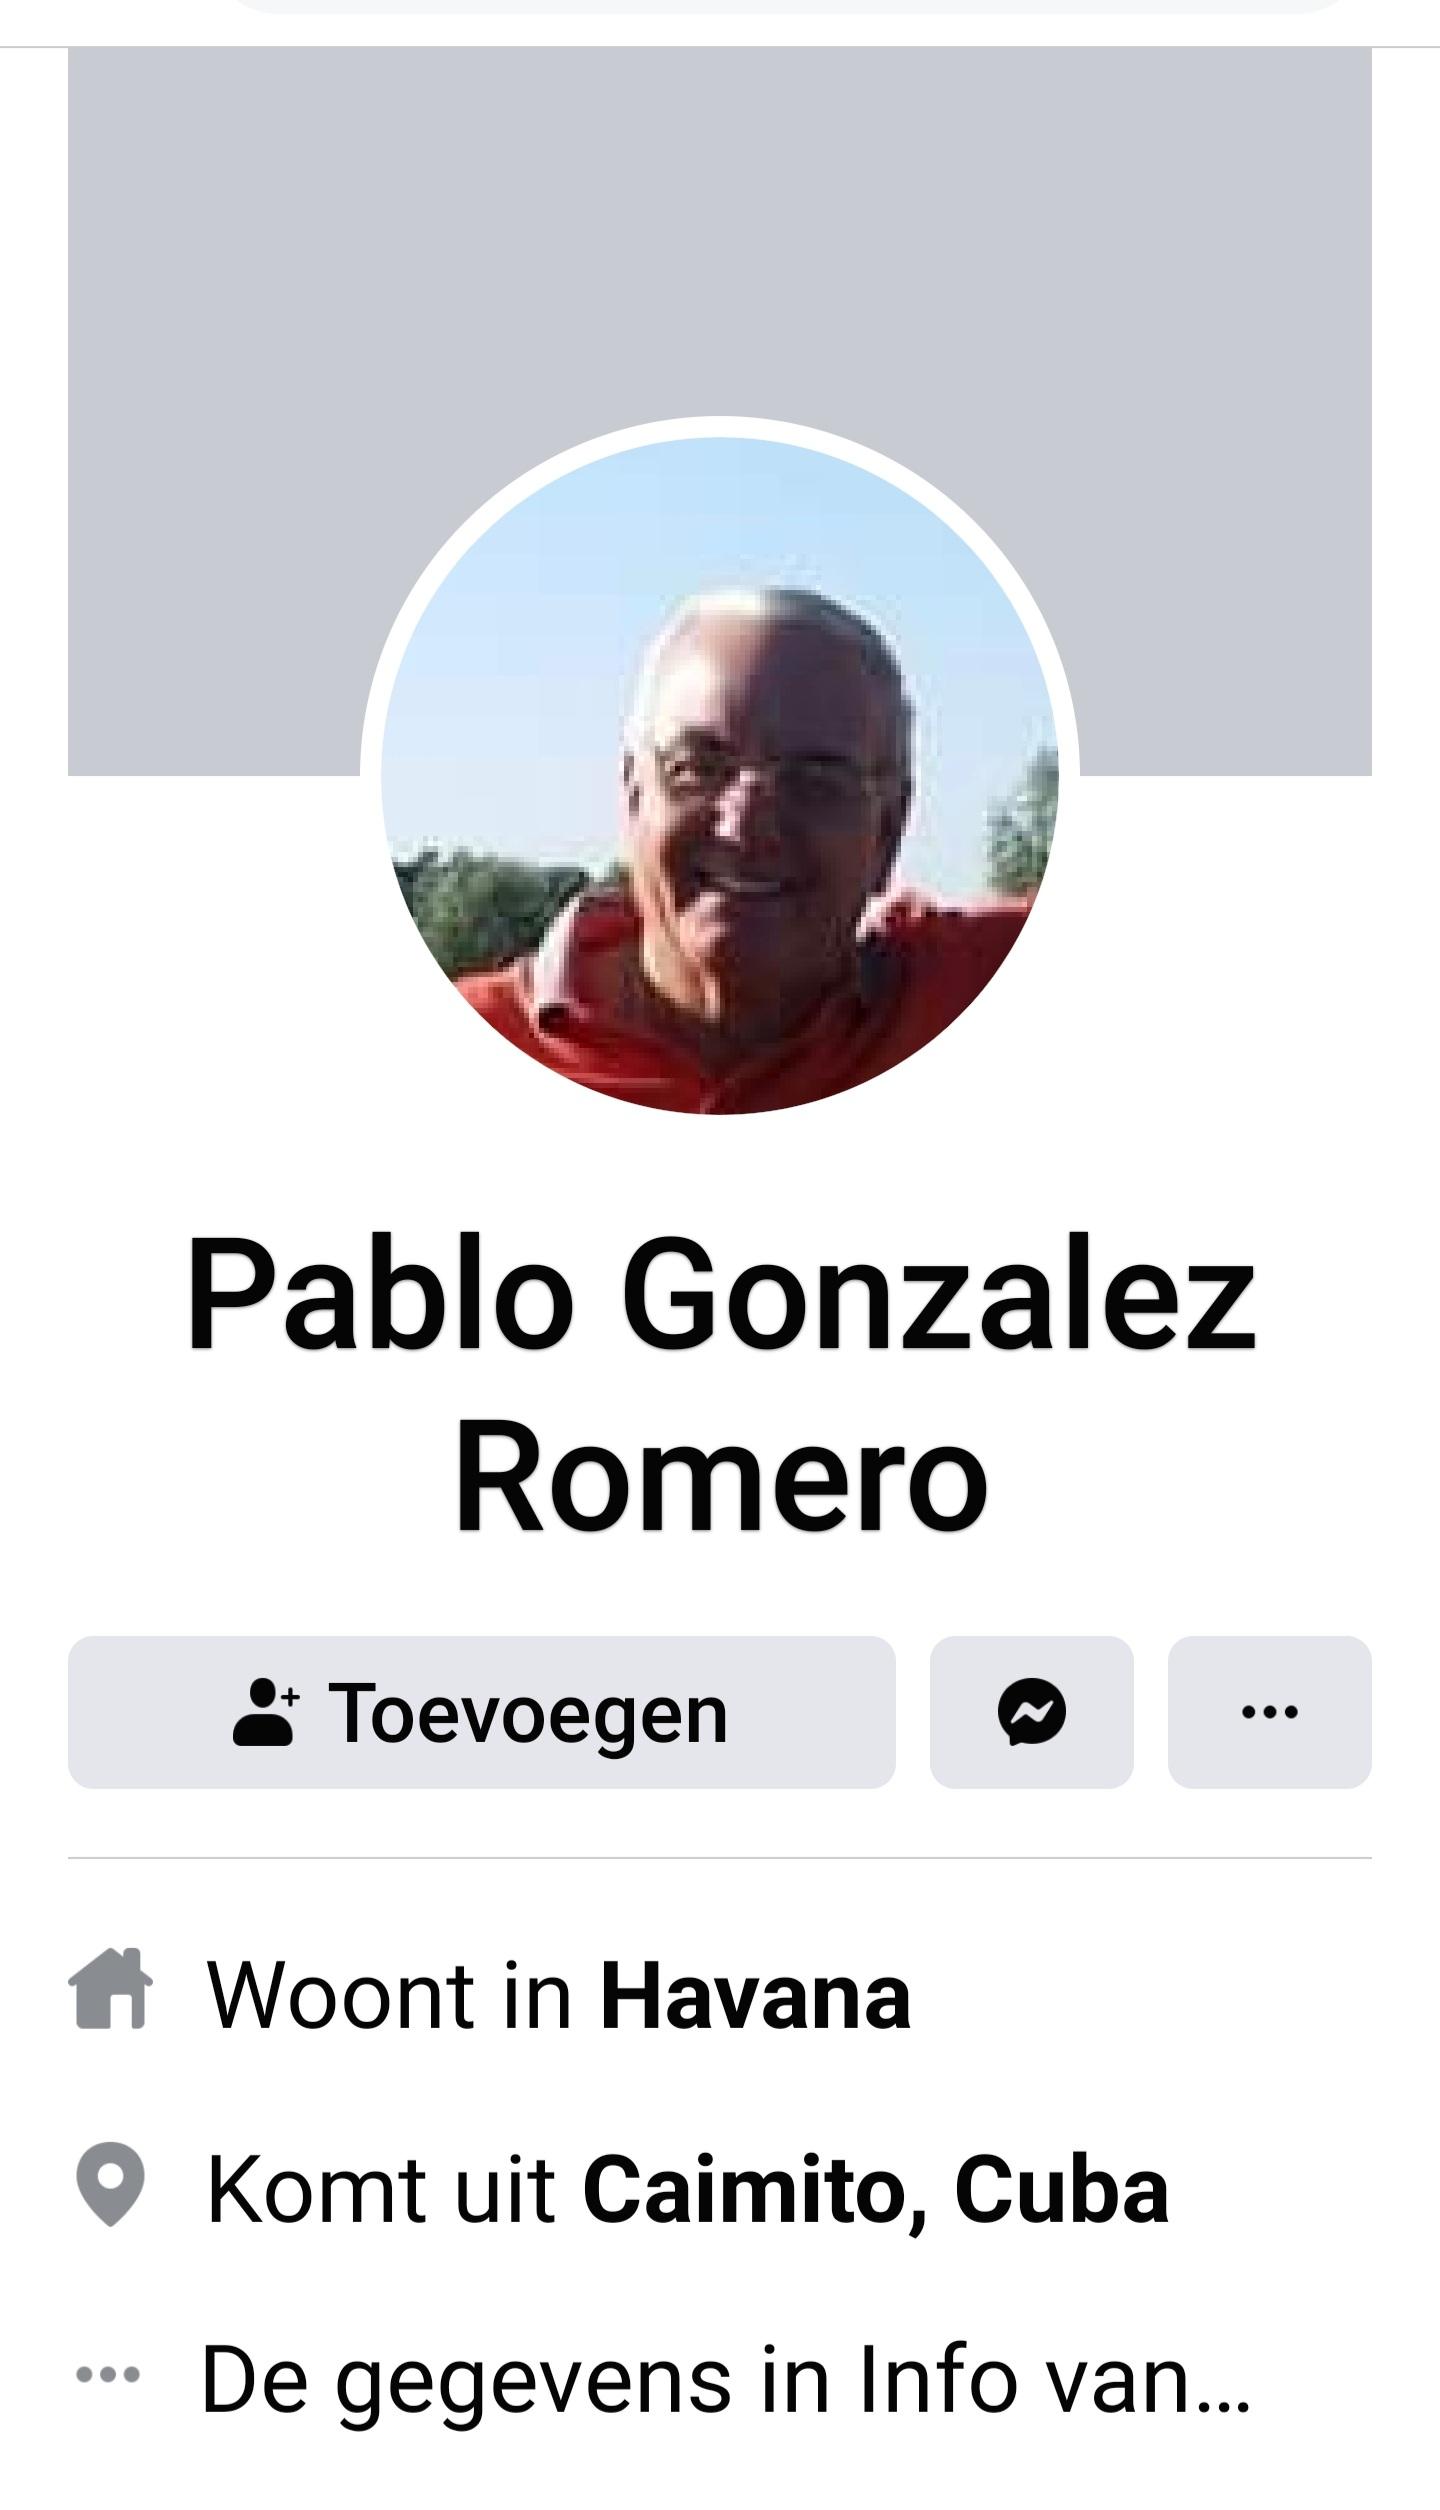 Pablo González Romero